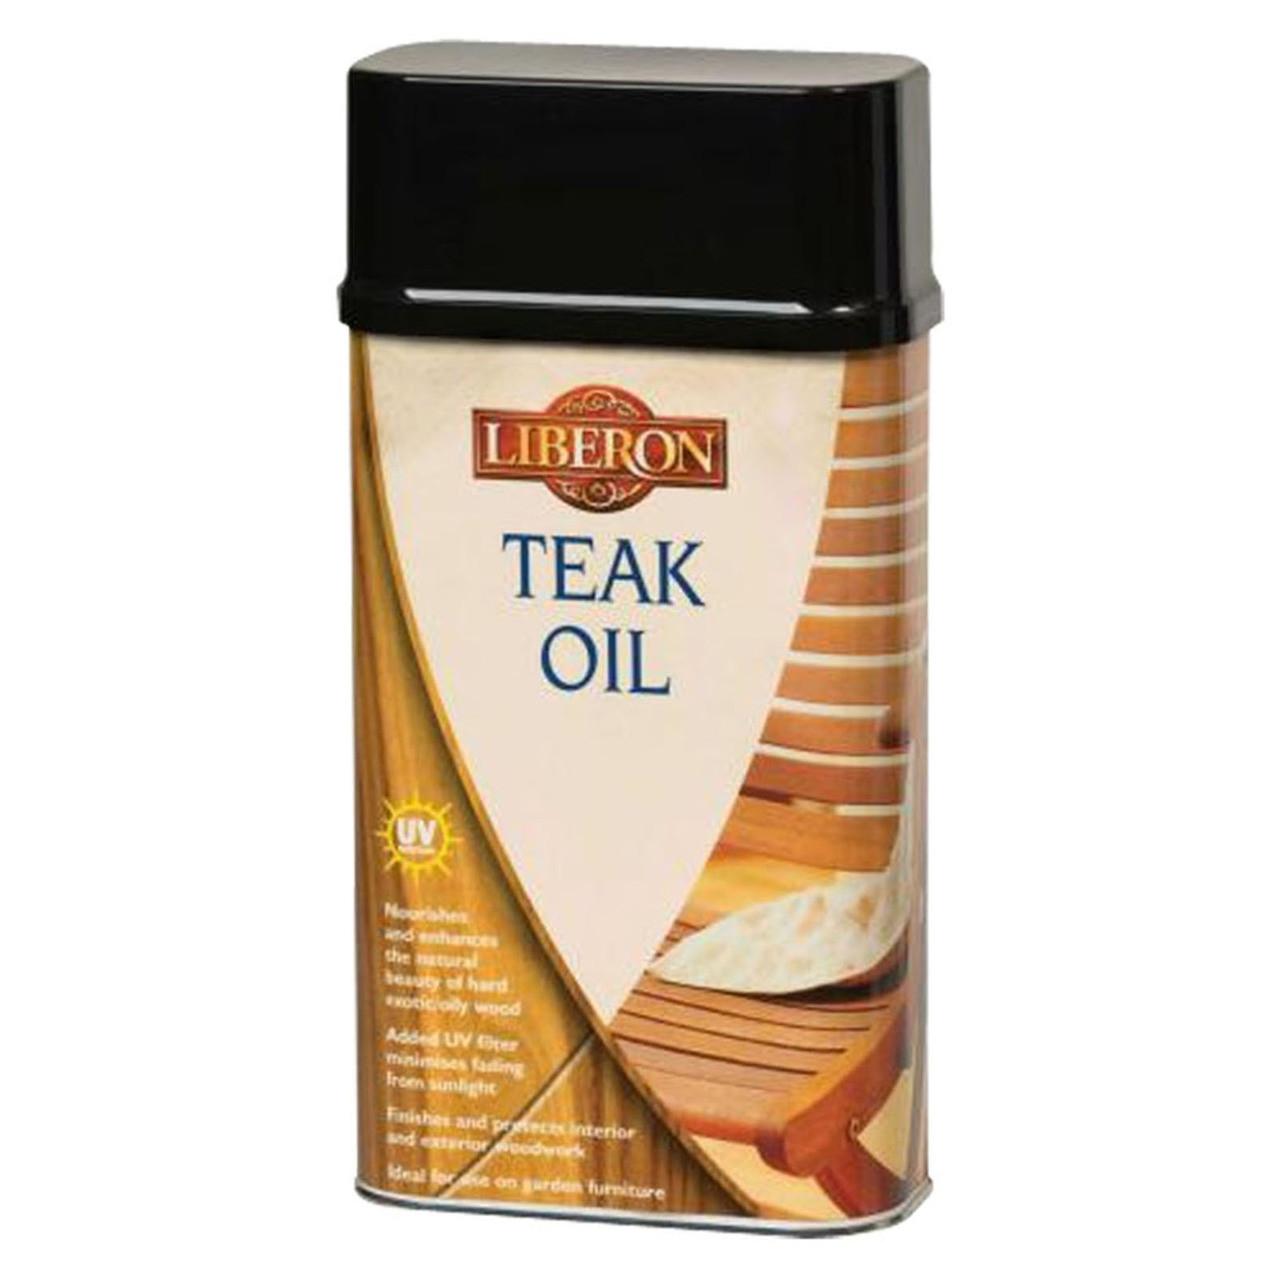 Liberon Teak Oil with UV Filter